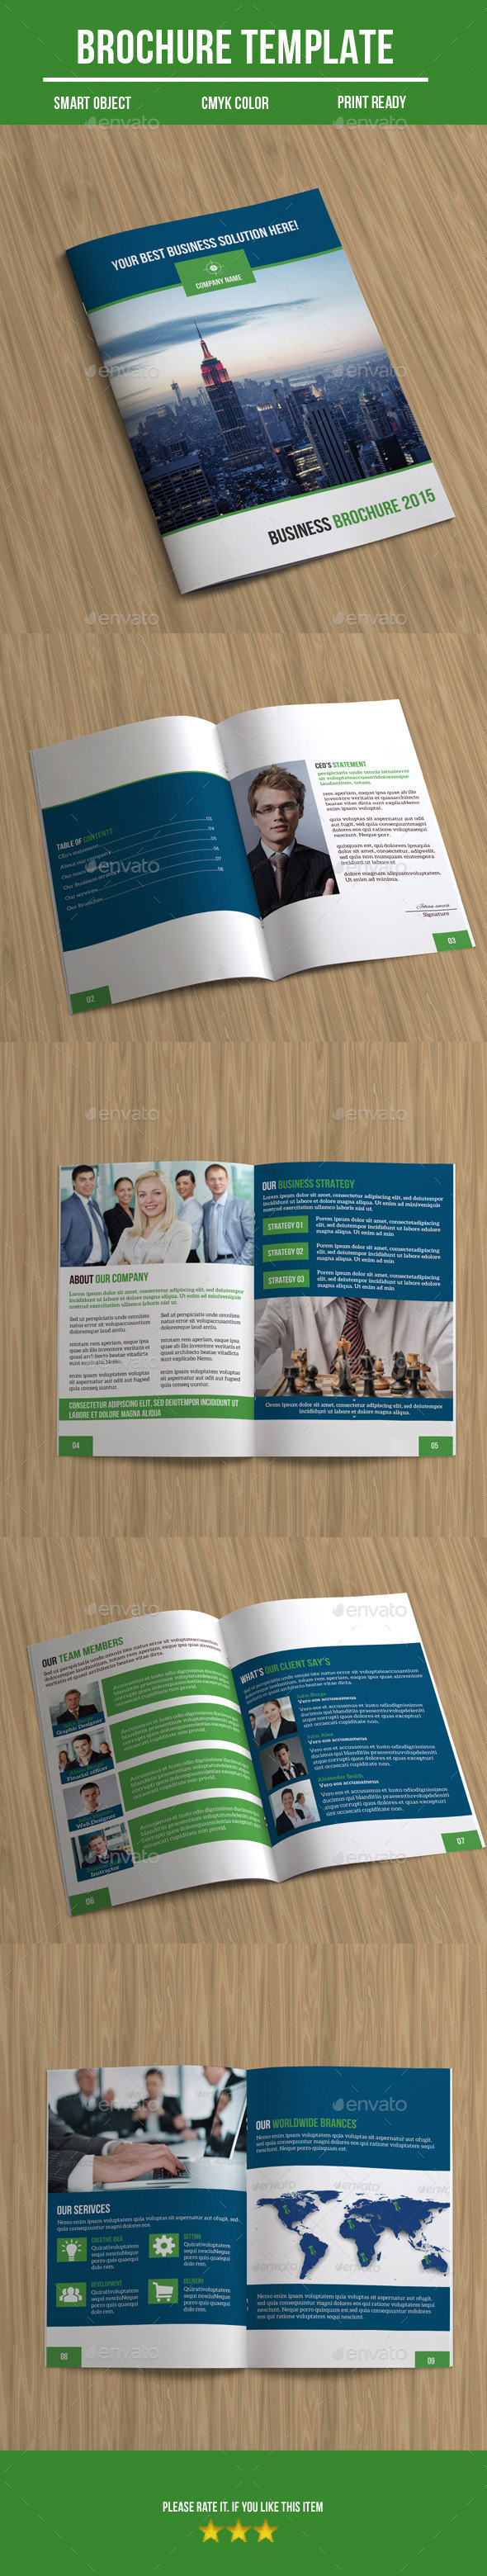 GraphicRiver Business Brochure 9739146